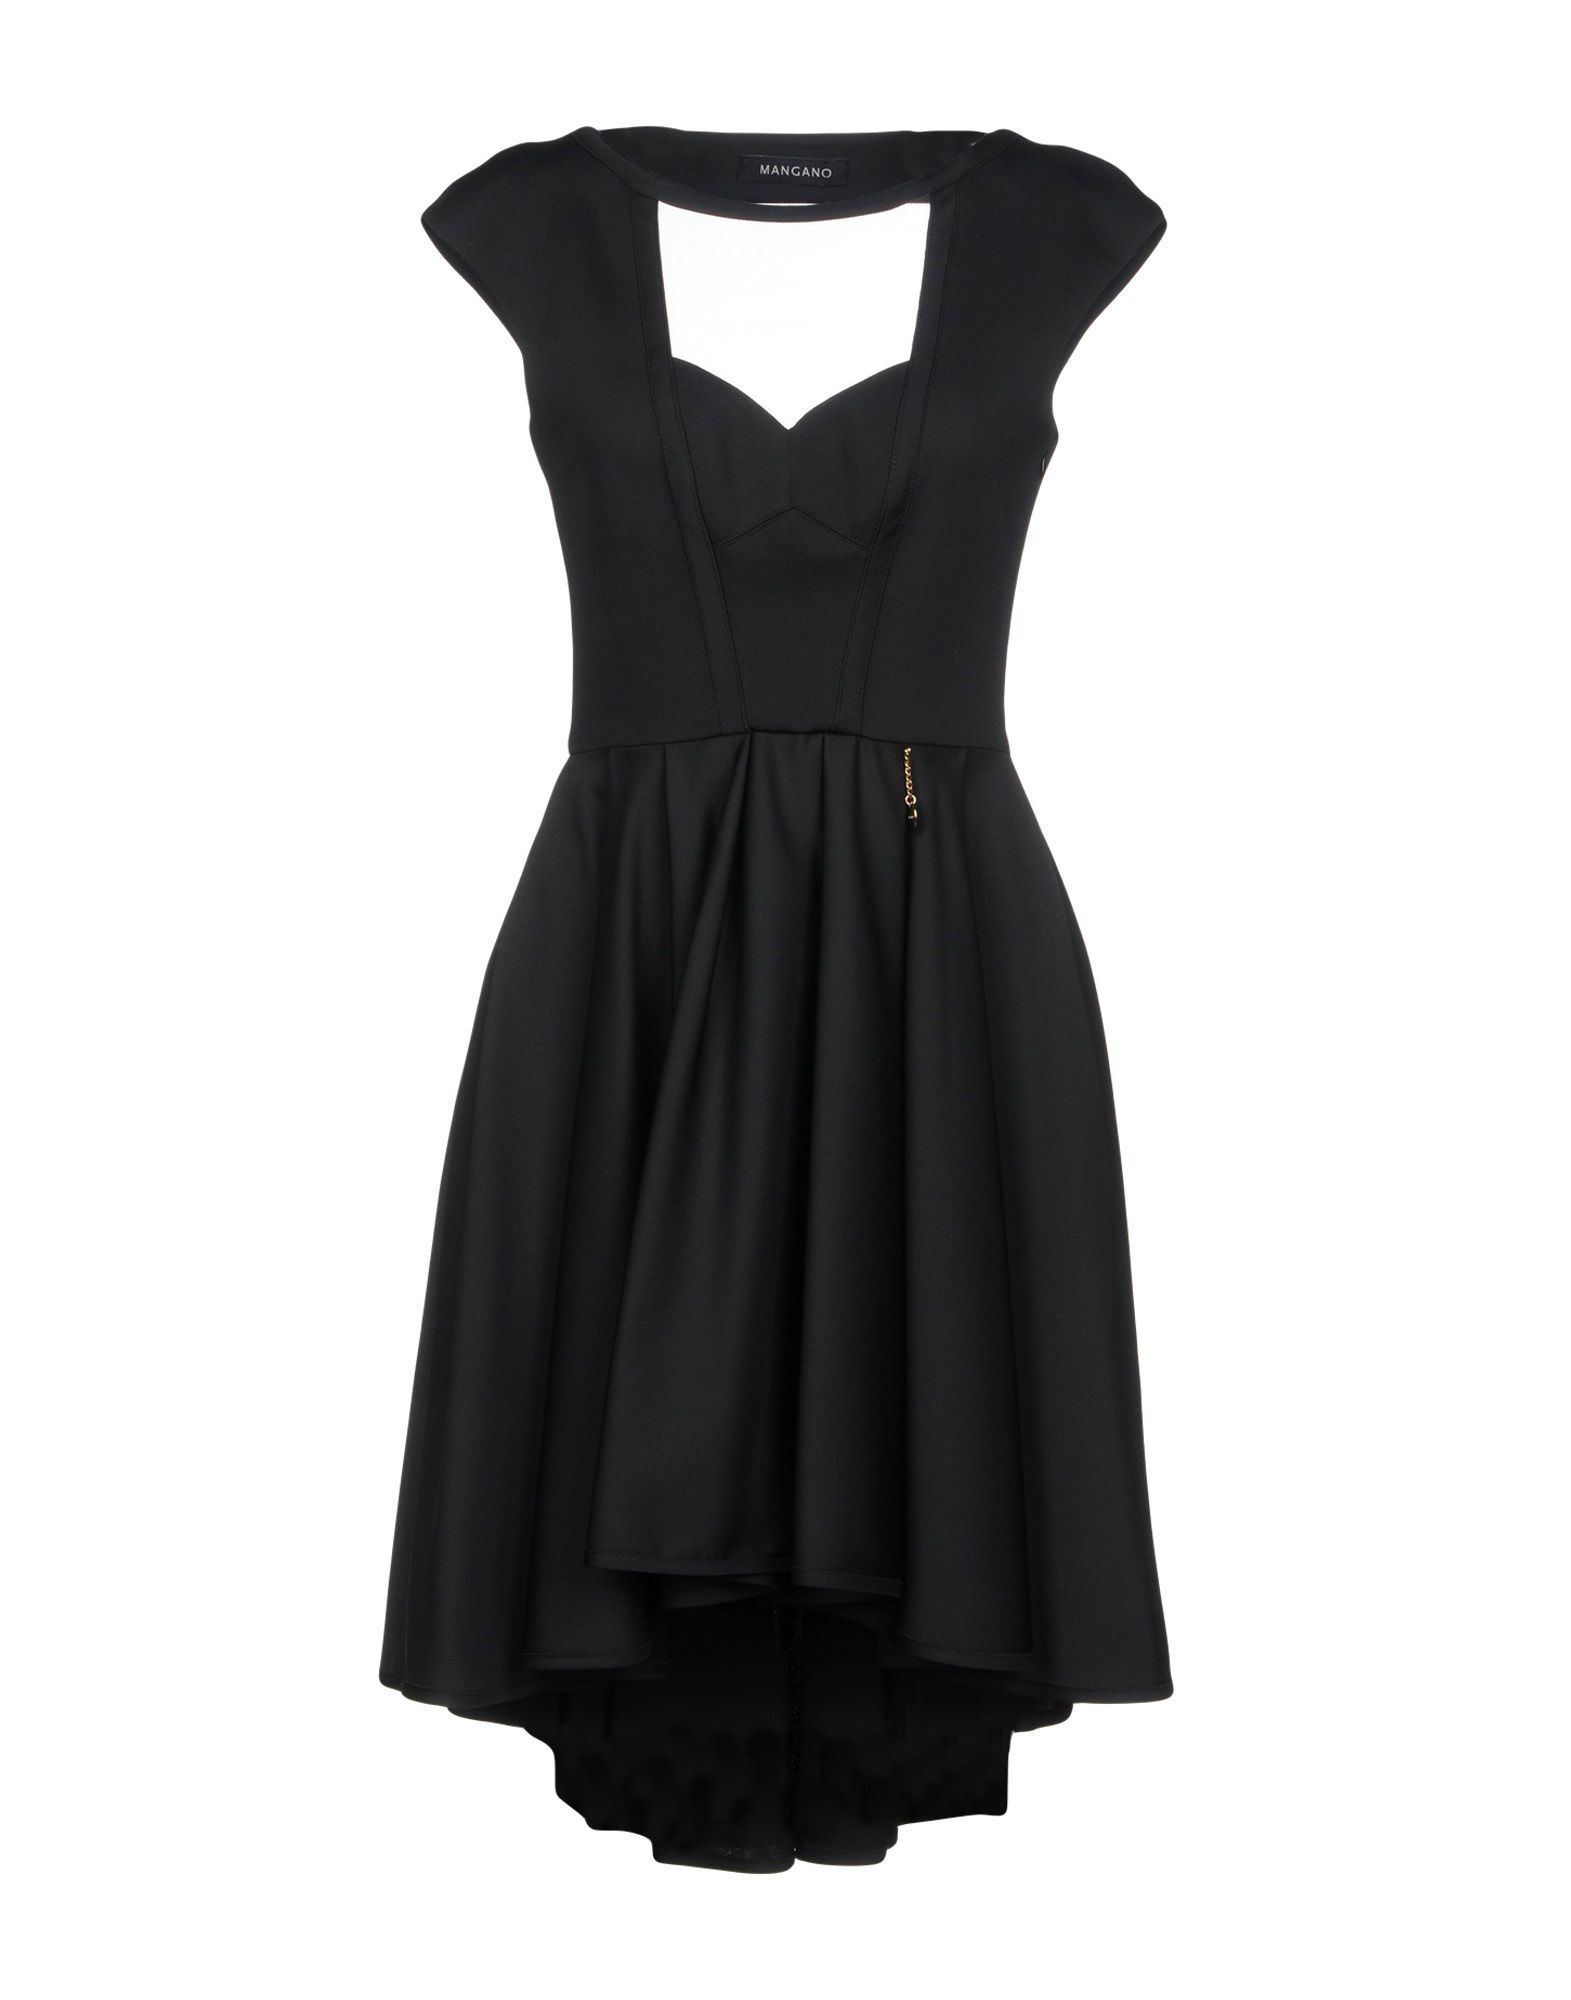 Mangano Black Tulle And Crepe Dress